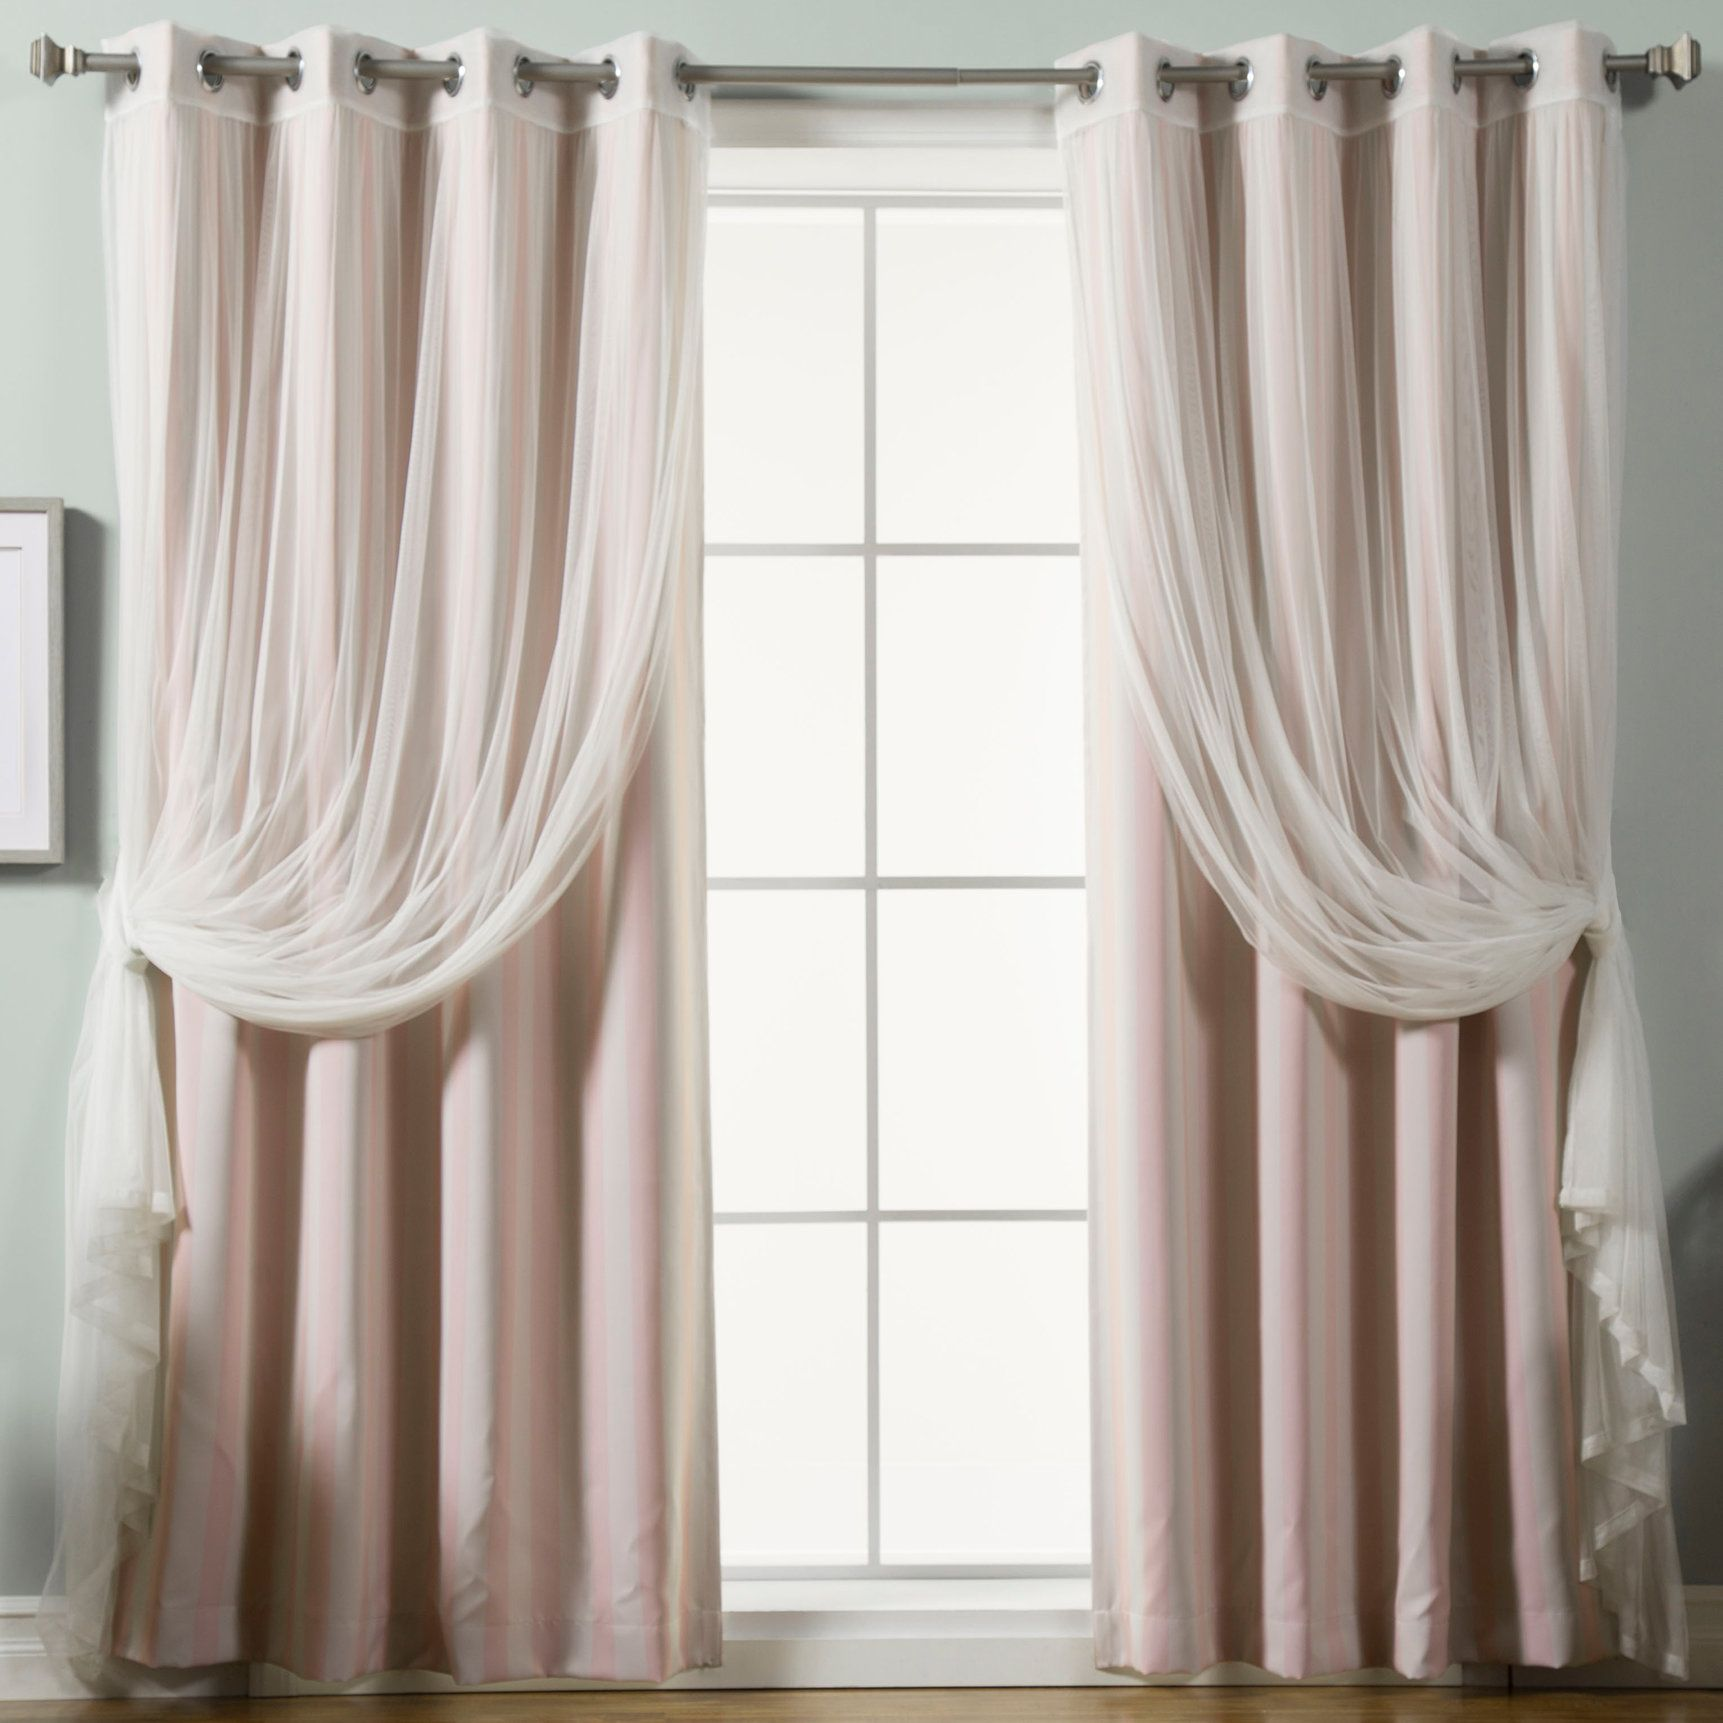 Baynton Striped Semi Sheer Thermal Grommet Curtain Panels Drapes